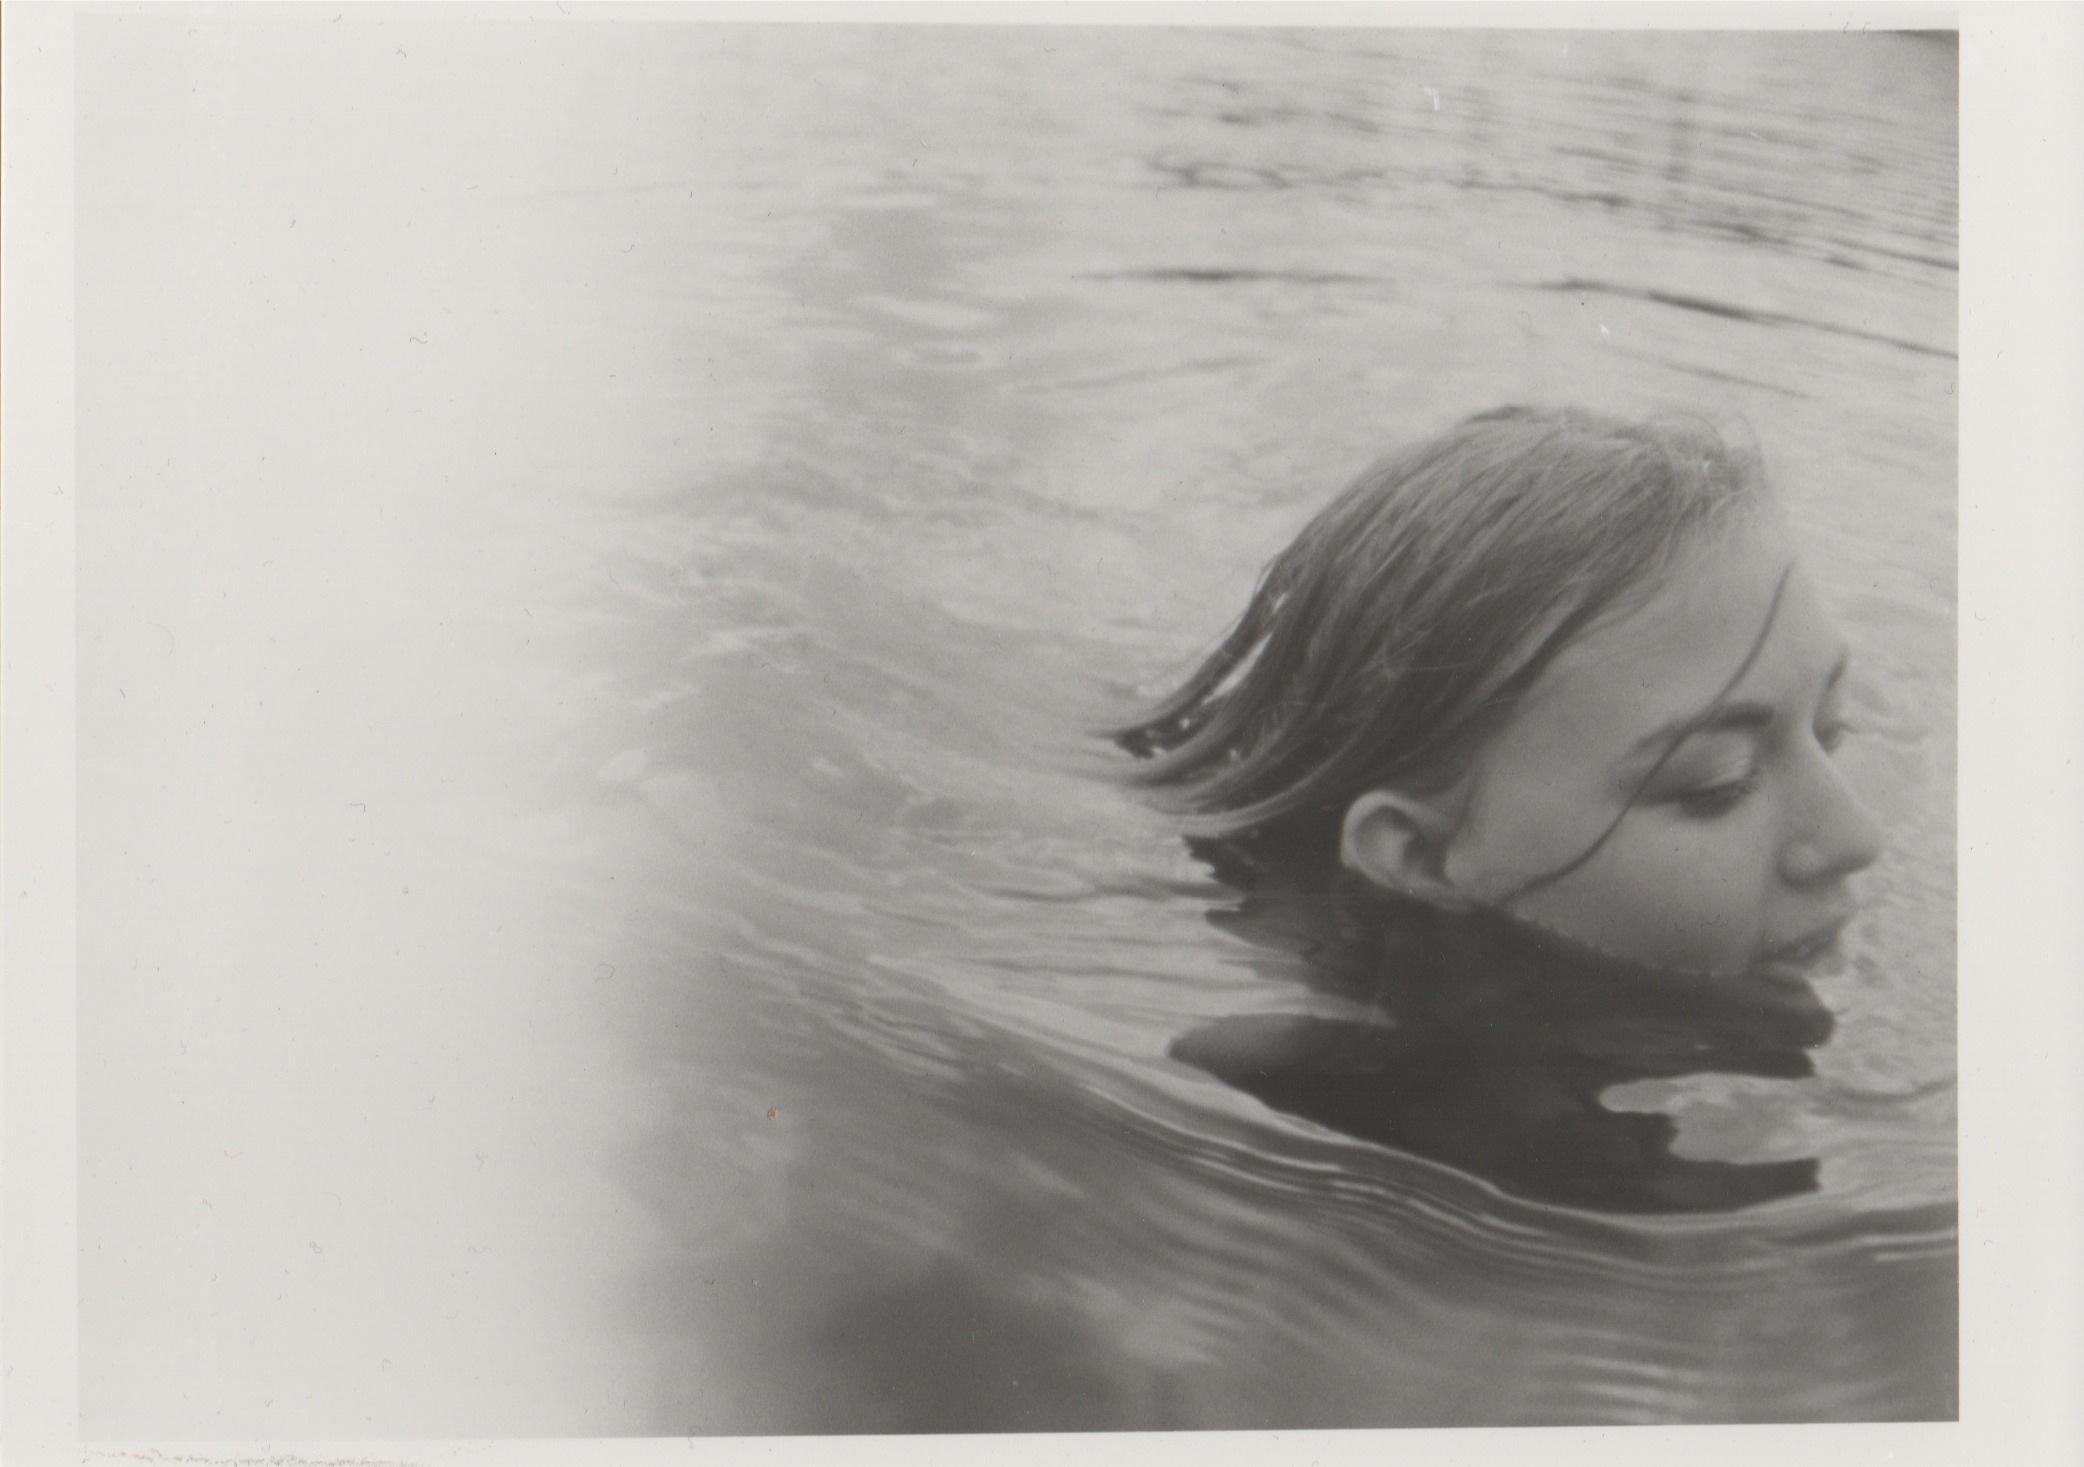 Johanna analogt by signehedberg